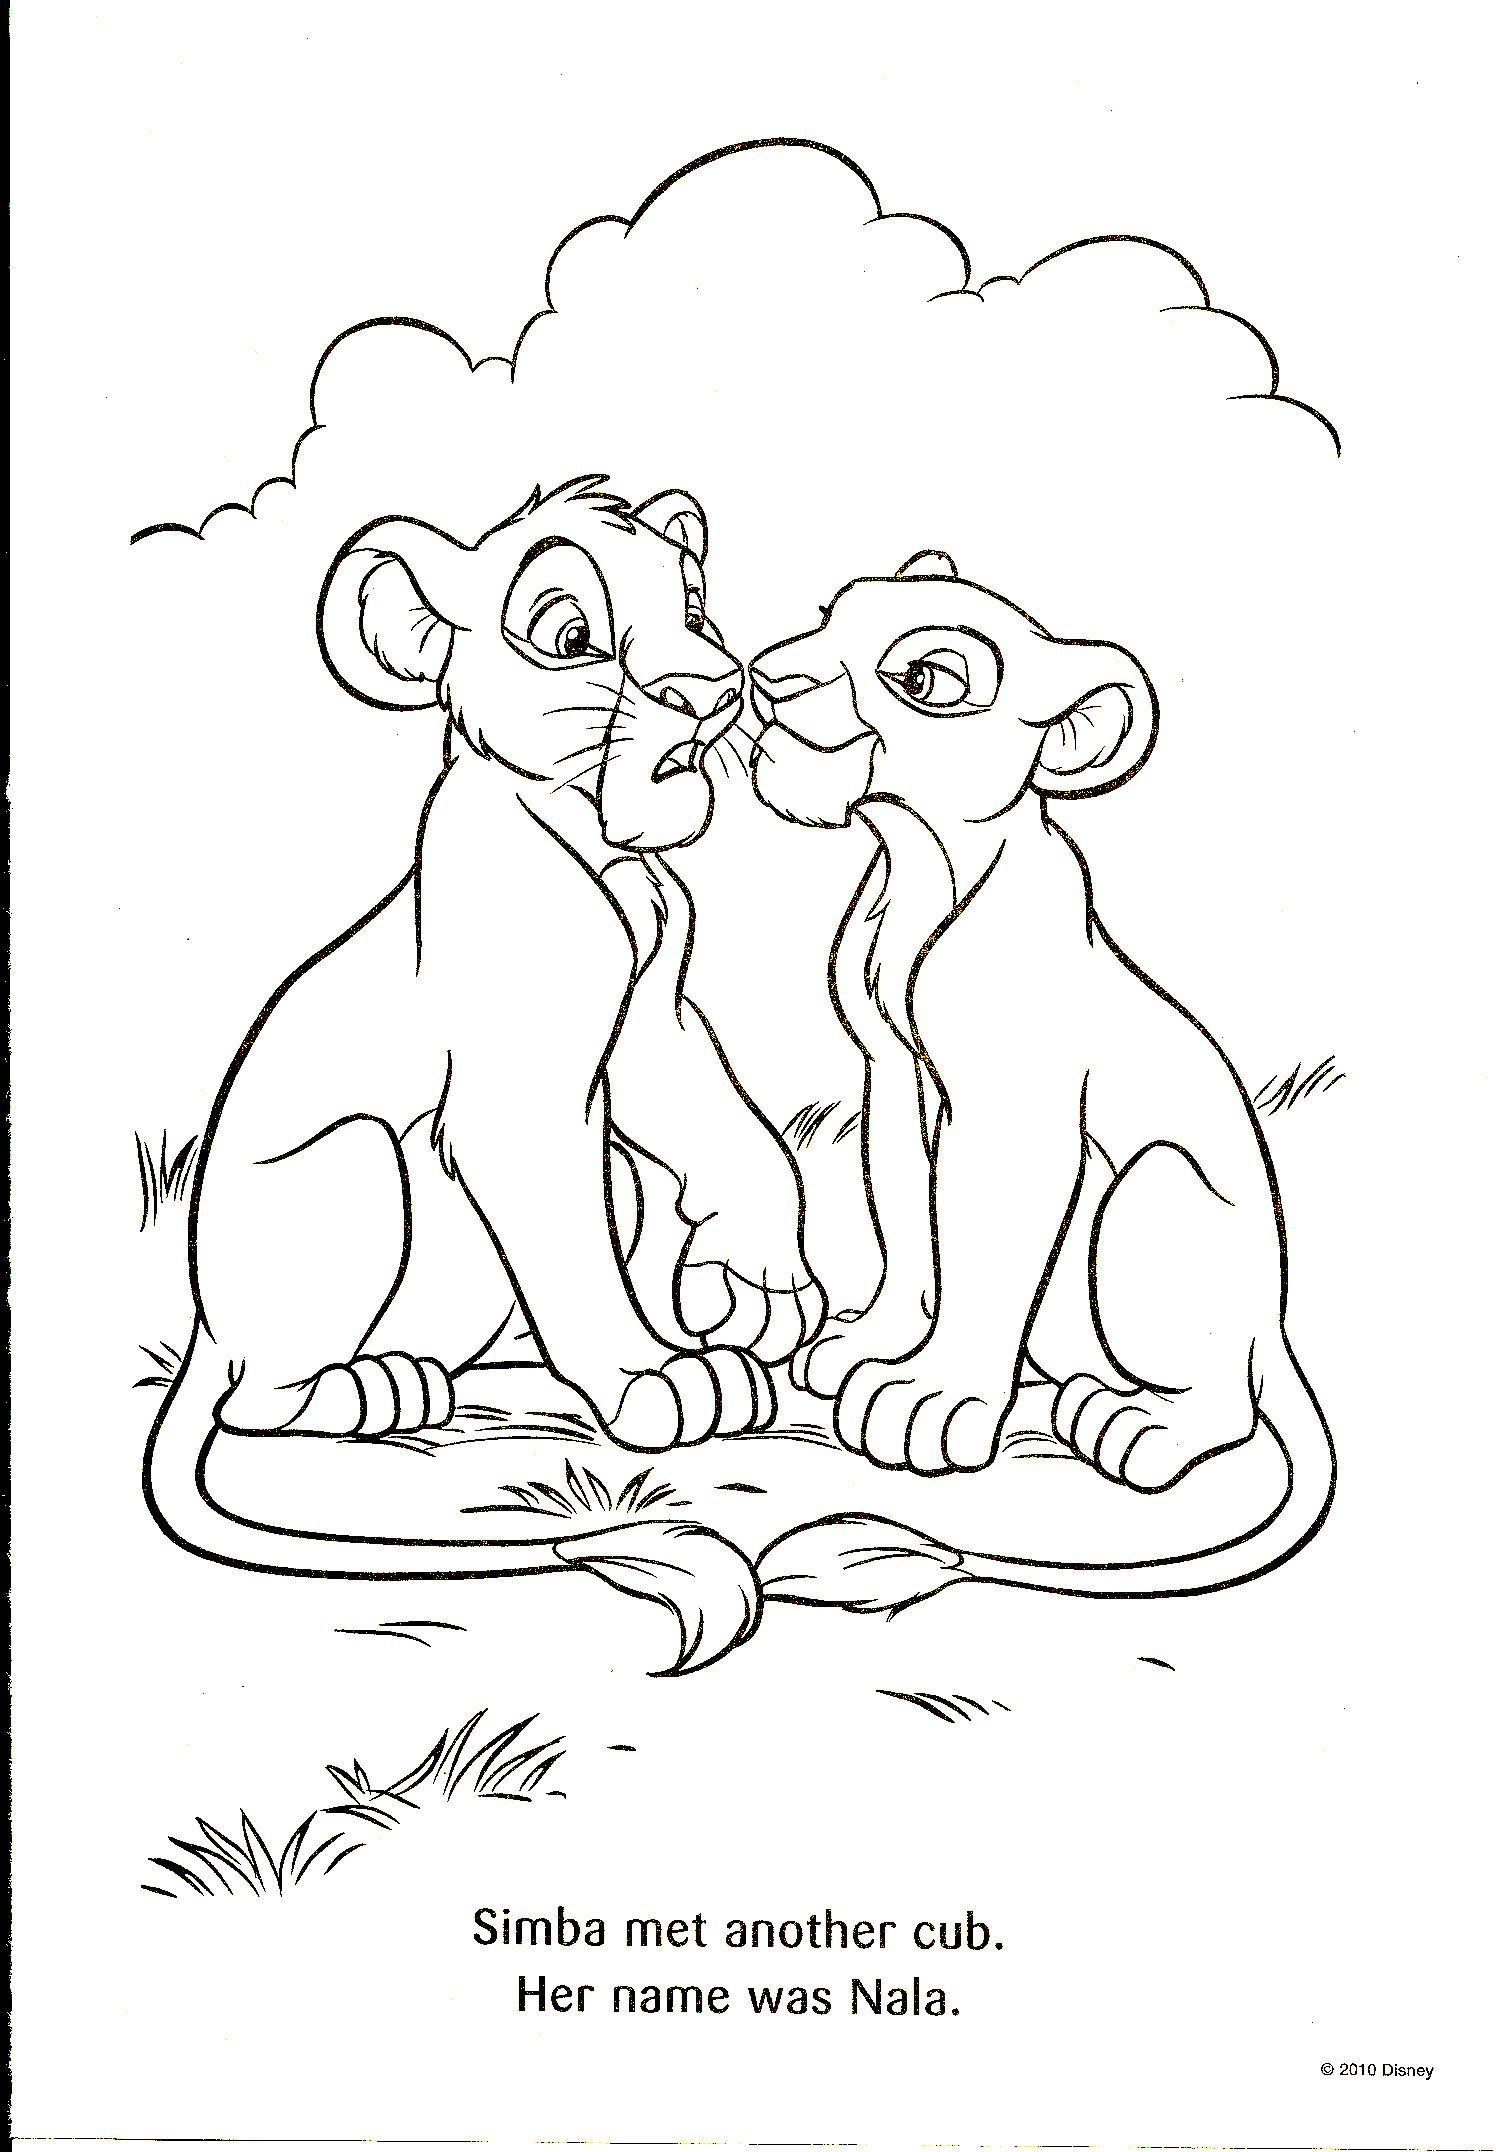 Pin von Taylor LeAnn auf Coloring Pages | Pinterest | Der löwe ...